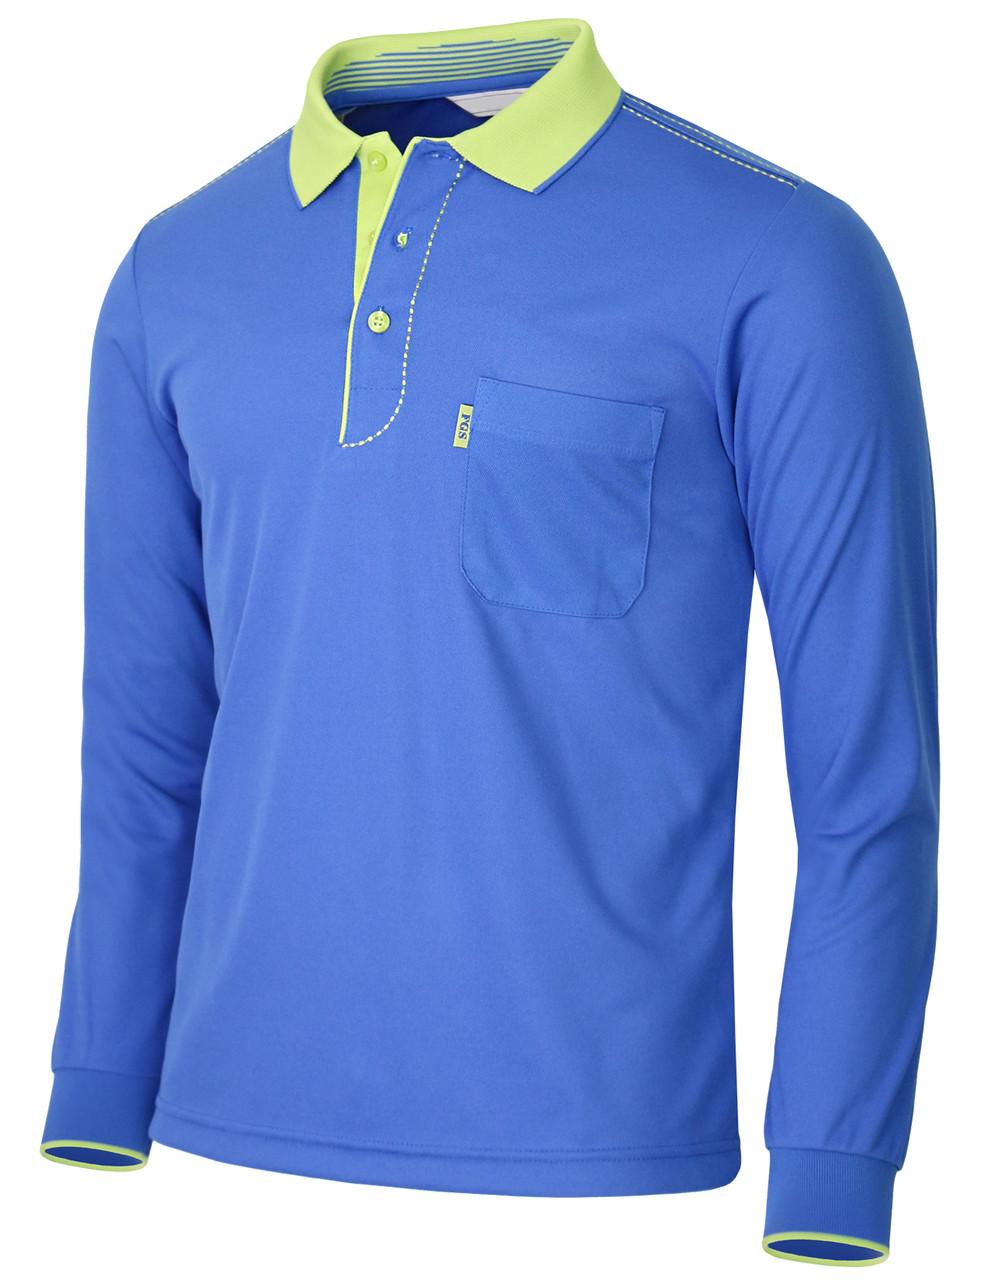 0085a11a ... Long Sleeve Dri Fit Stitch Point Polo Shirt-Unisex · cobalt-side